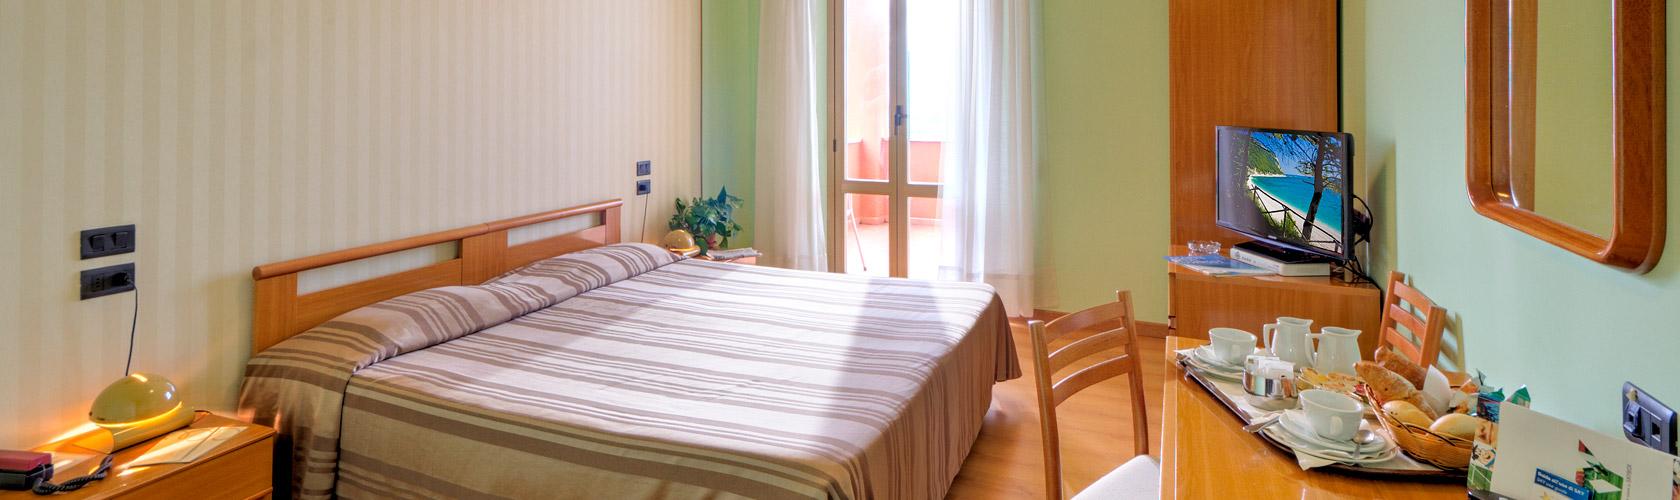 hotel-ancona-sud01